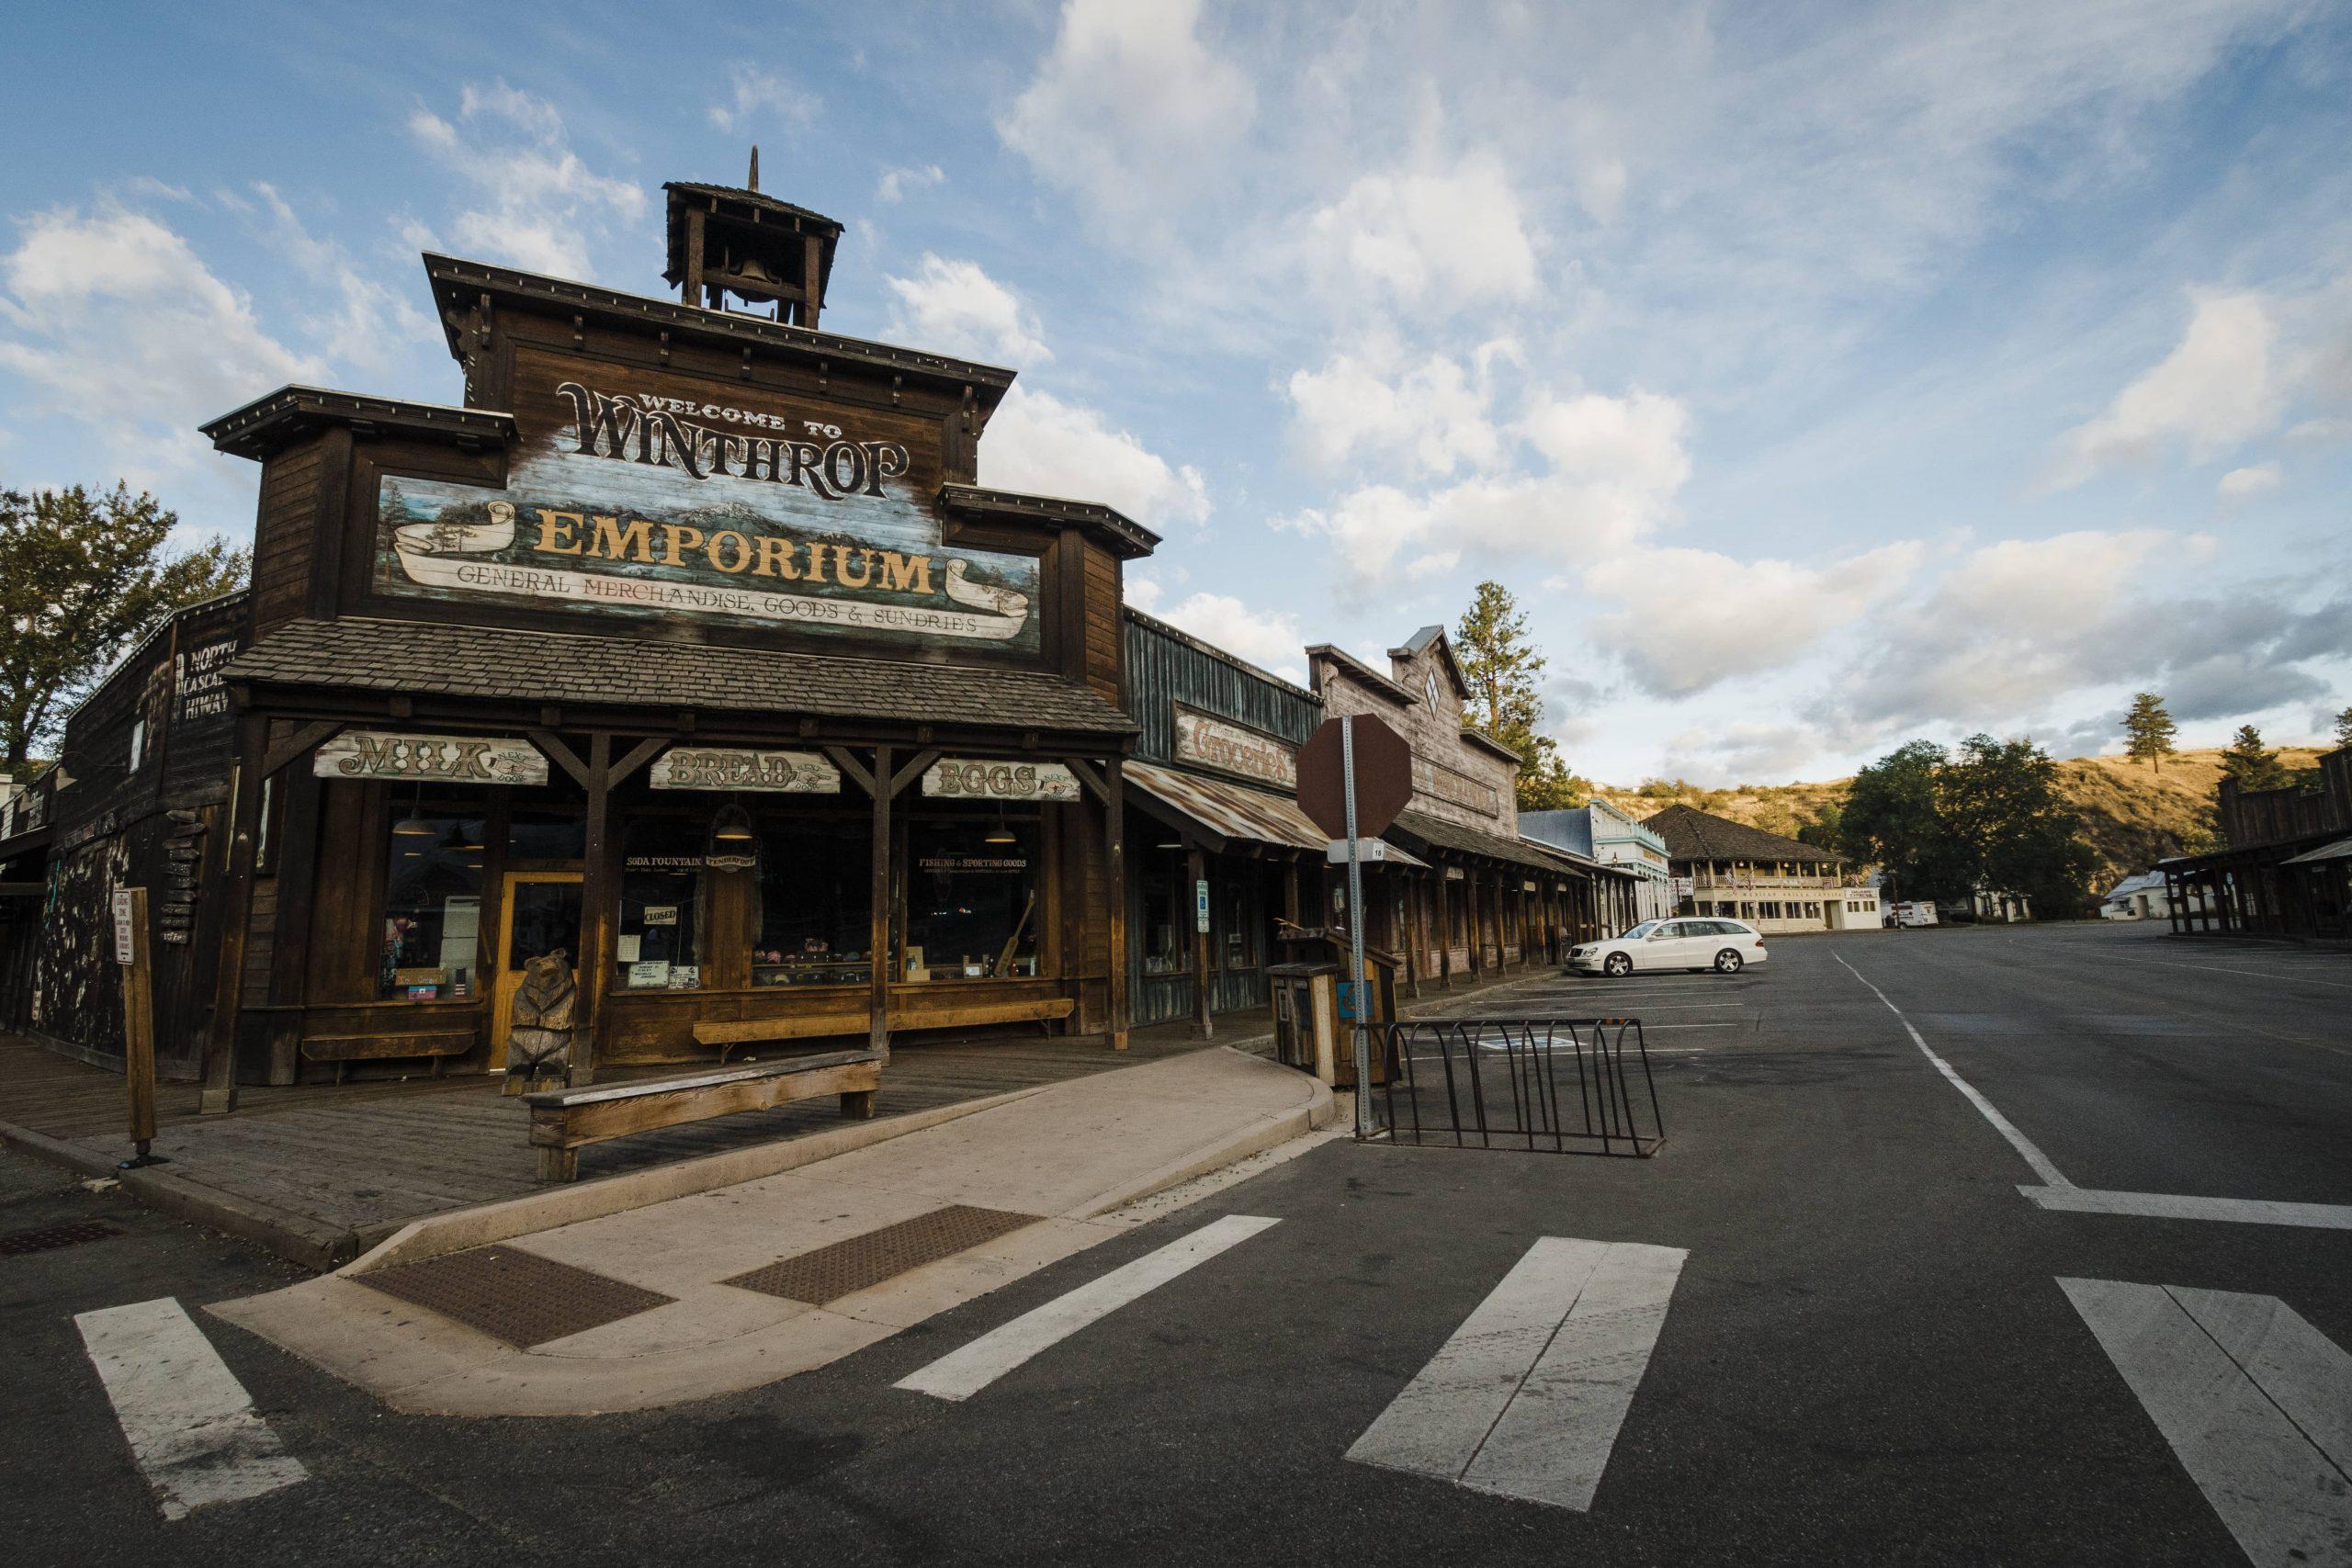 The Winthrop Emporium store in downtown Winthrop, Washington